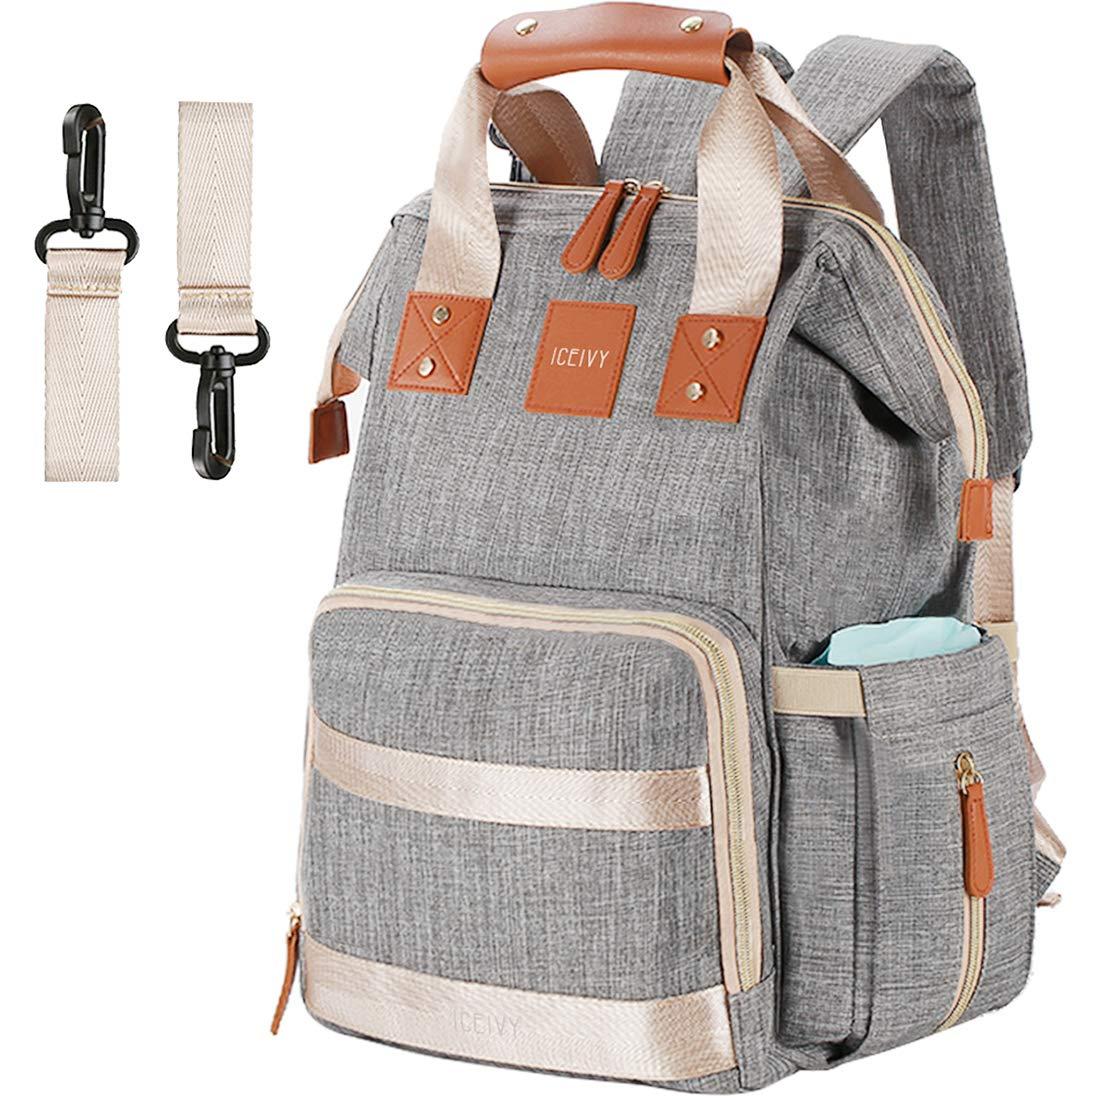 Backpack Diaper Bag Backpack, Baby Bag Baby Diaper Bag,Multi-Function Waterproof for Girl,Boy,Men,Mom,Dad, Large Capacity, Stylish,Durable,Gray Liyuan creative-US LYDB01